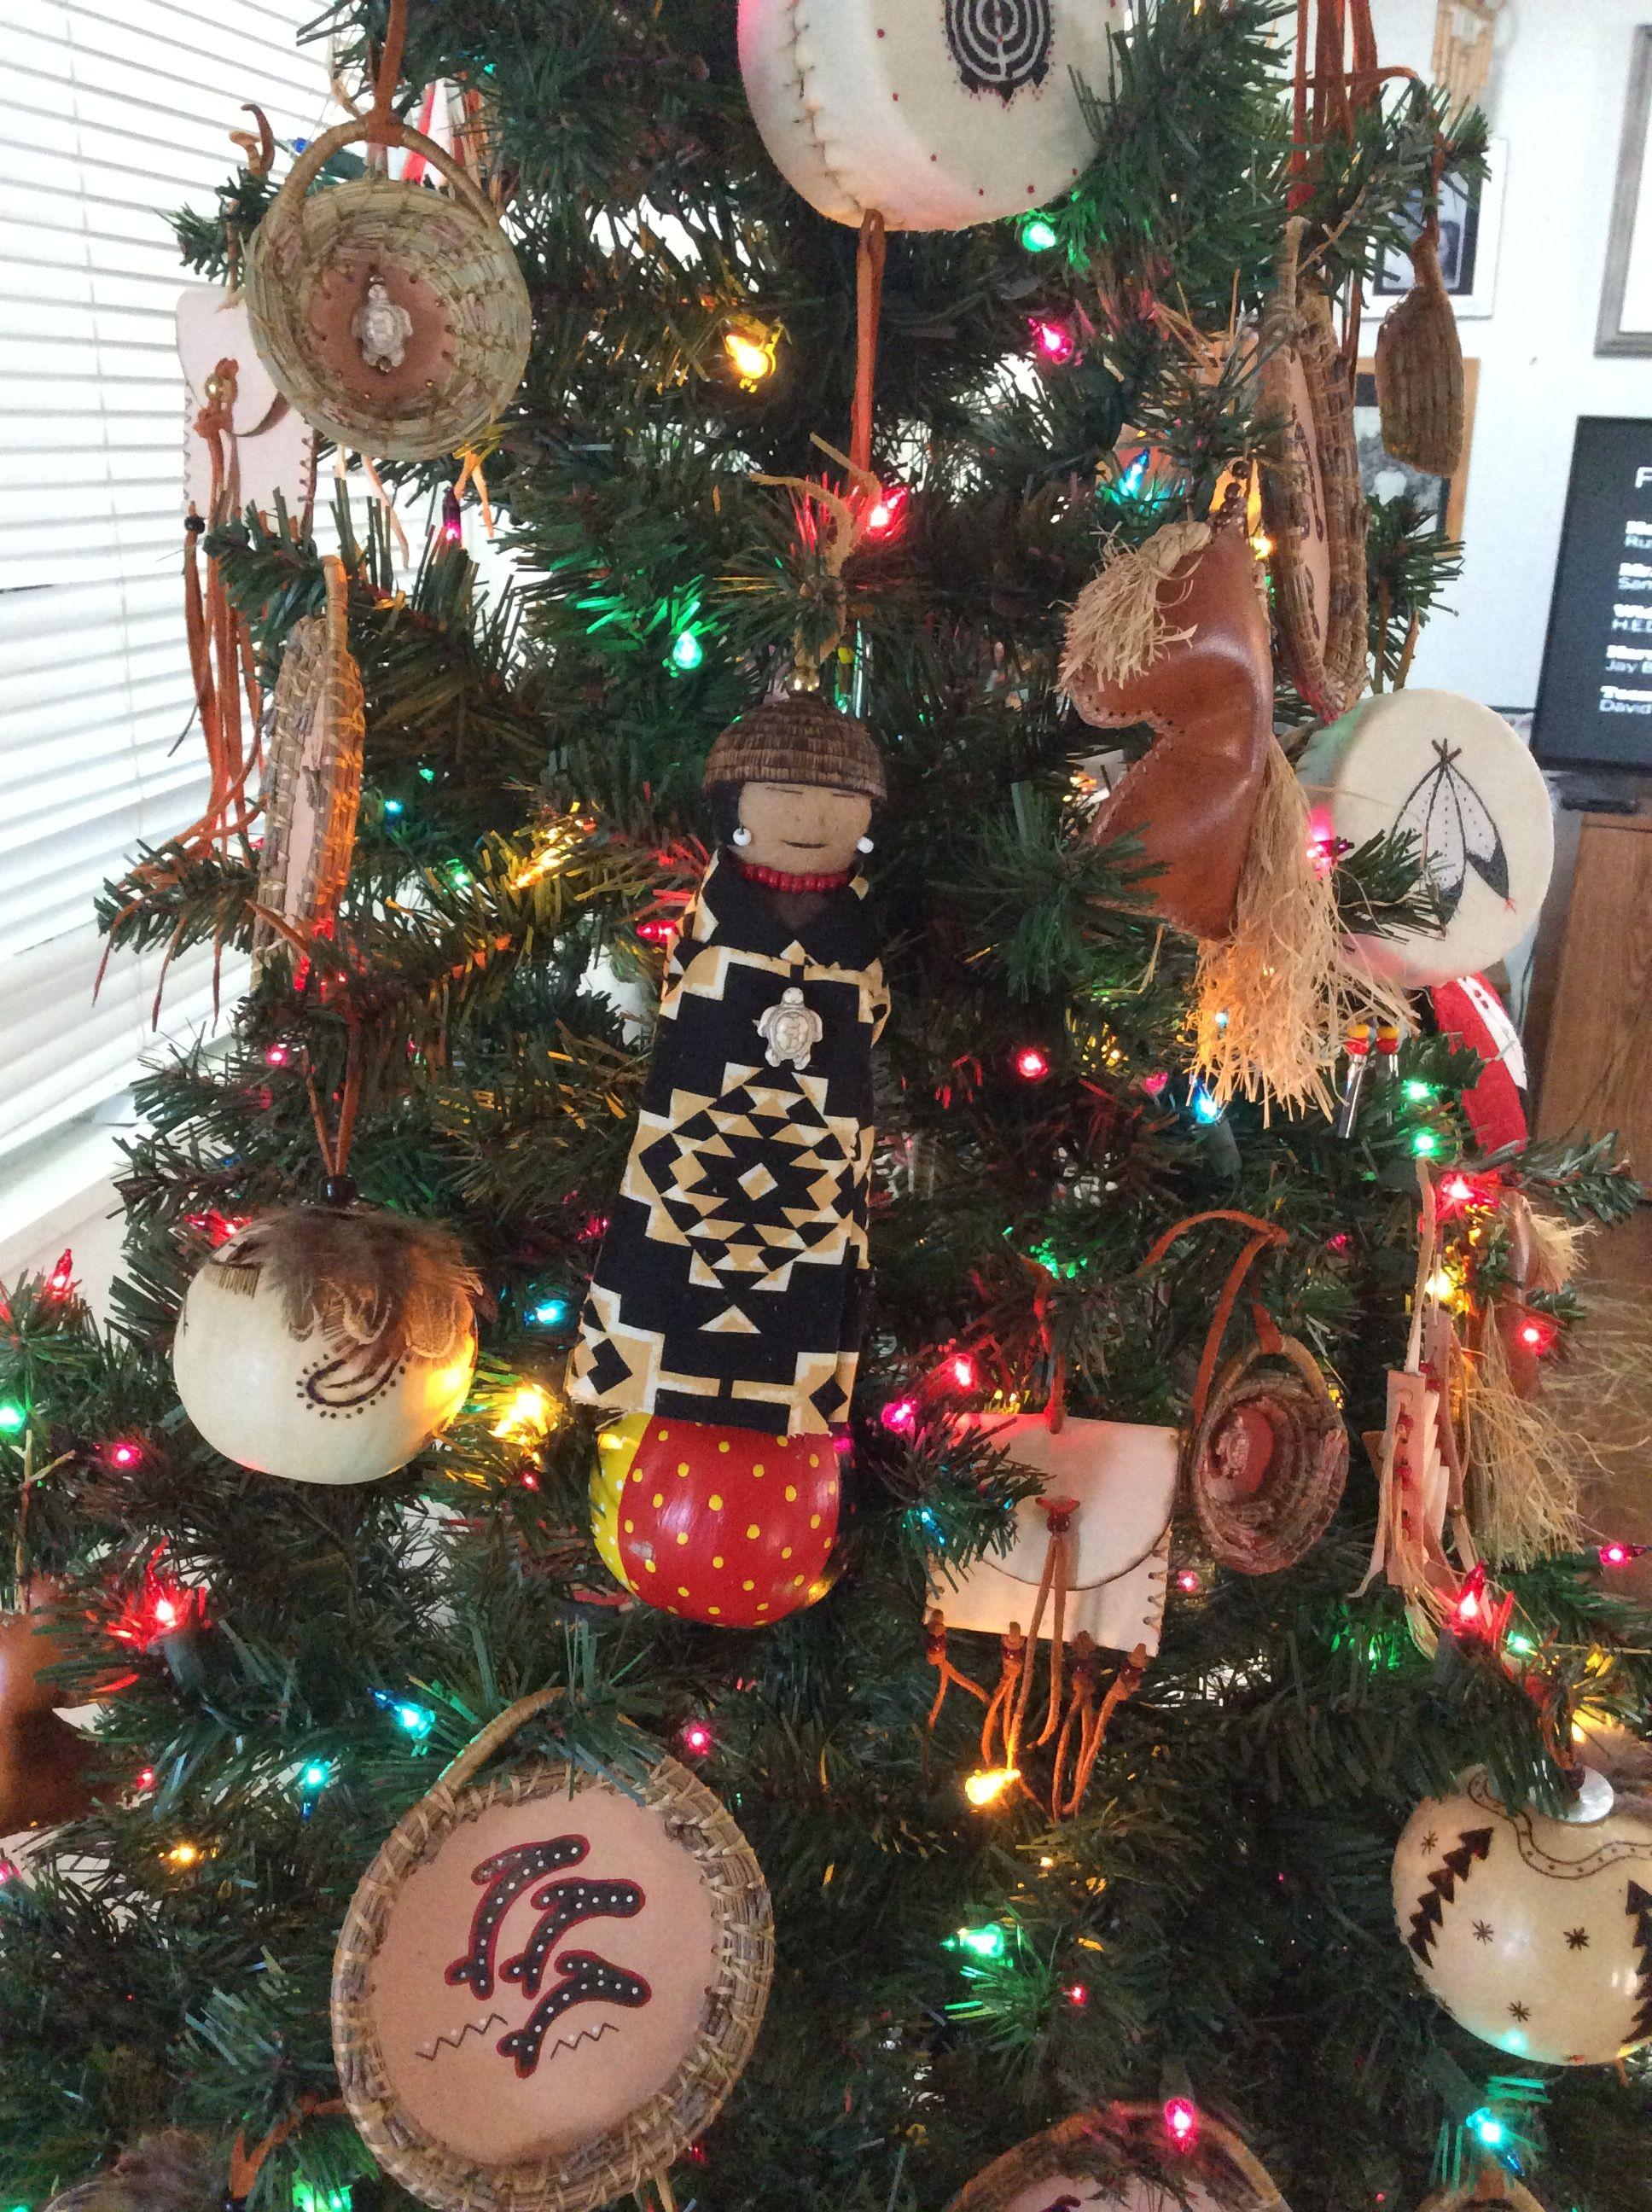 Christmas Tree With Hand Crafted Native American Ornaments By Pita Romero Macias Diy Christmas Ornaments Christmas Tree Decorations Xmas Decorations